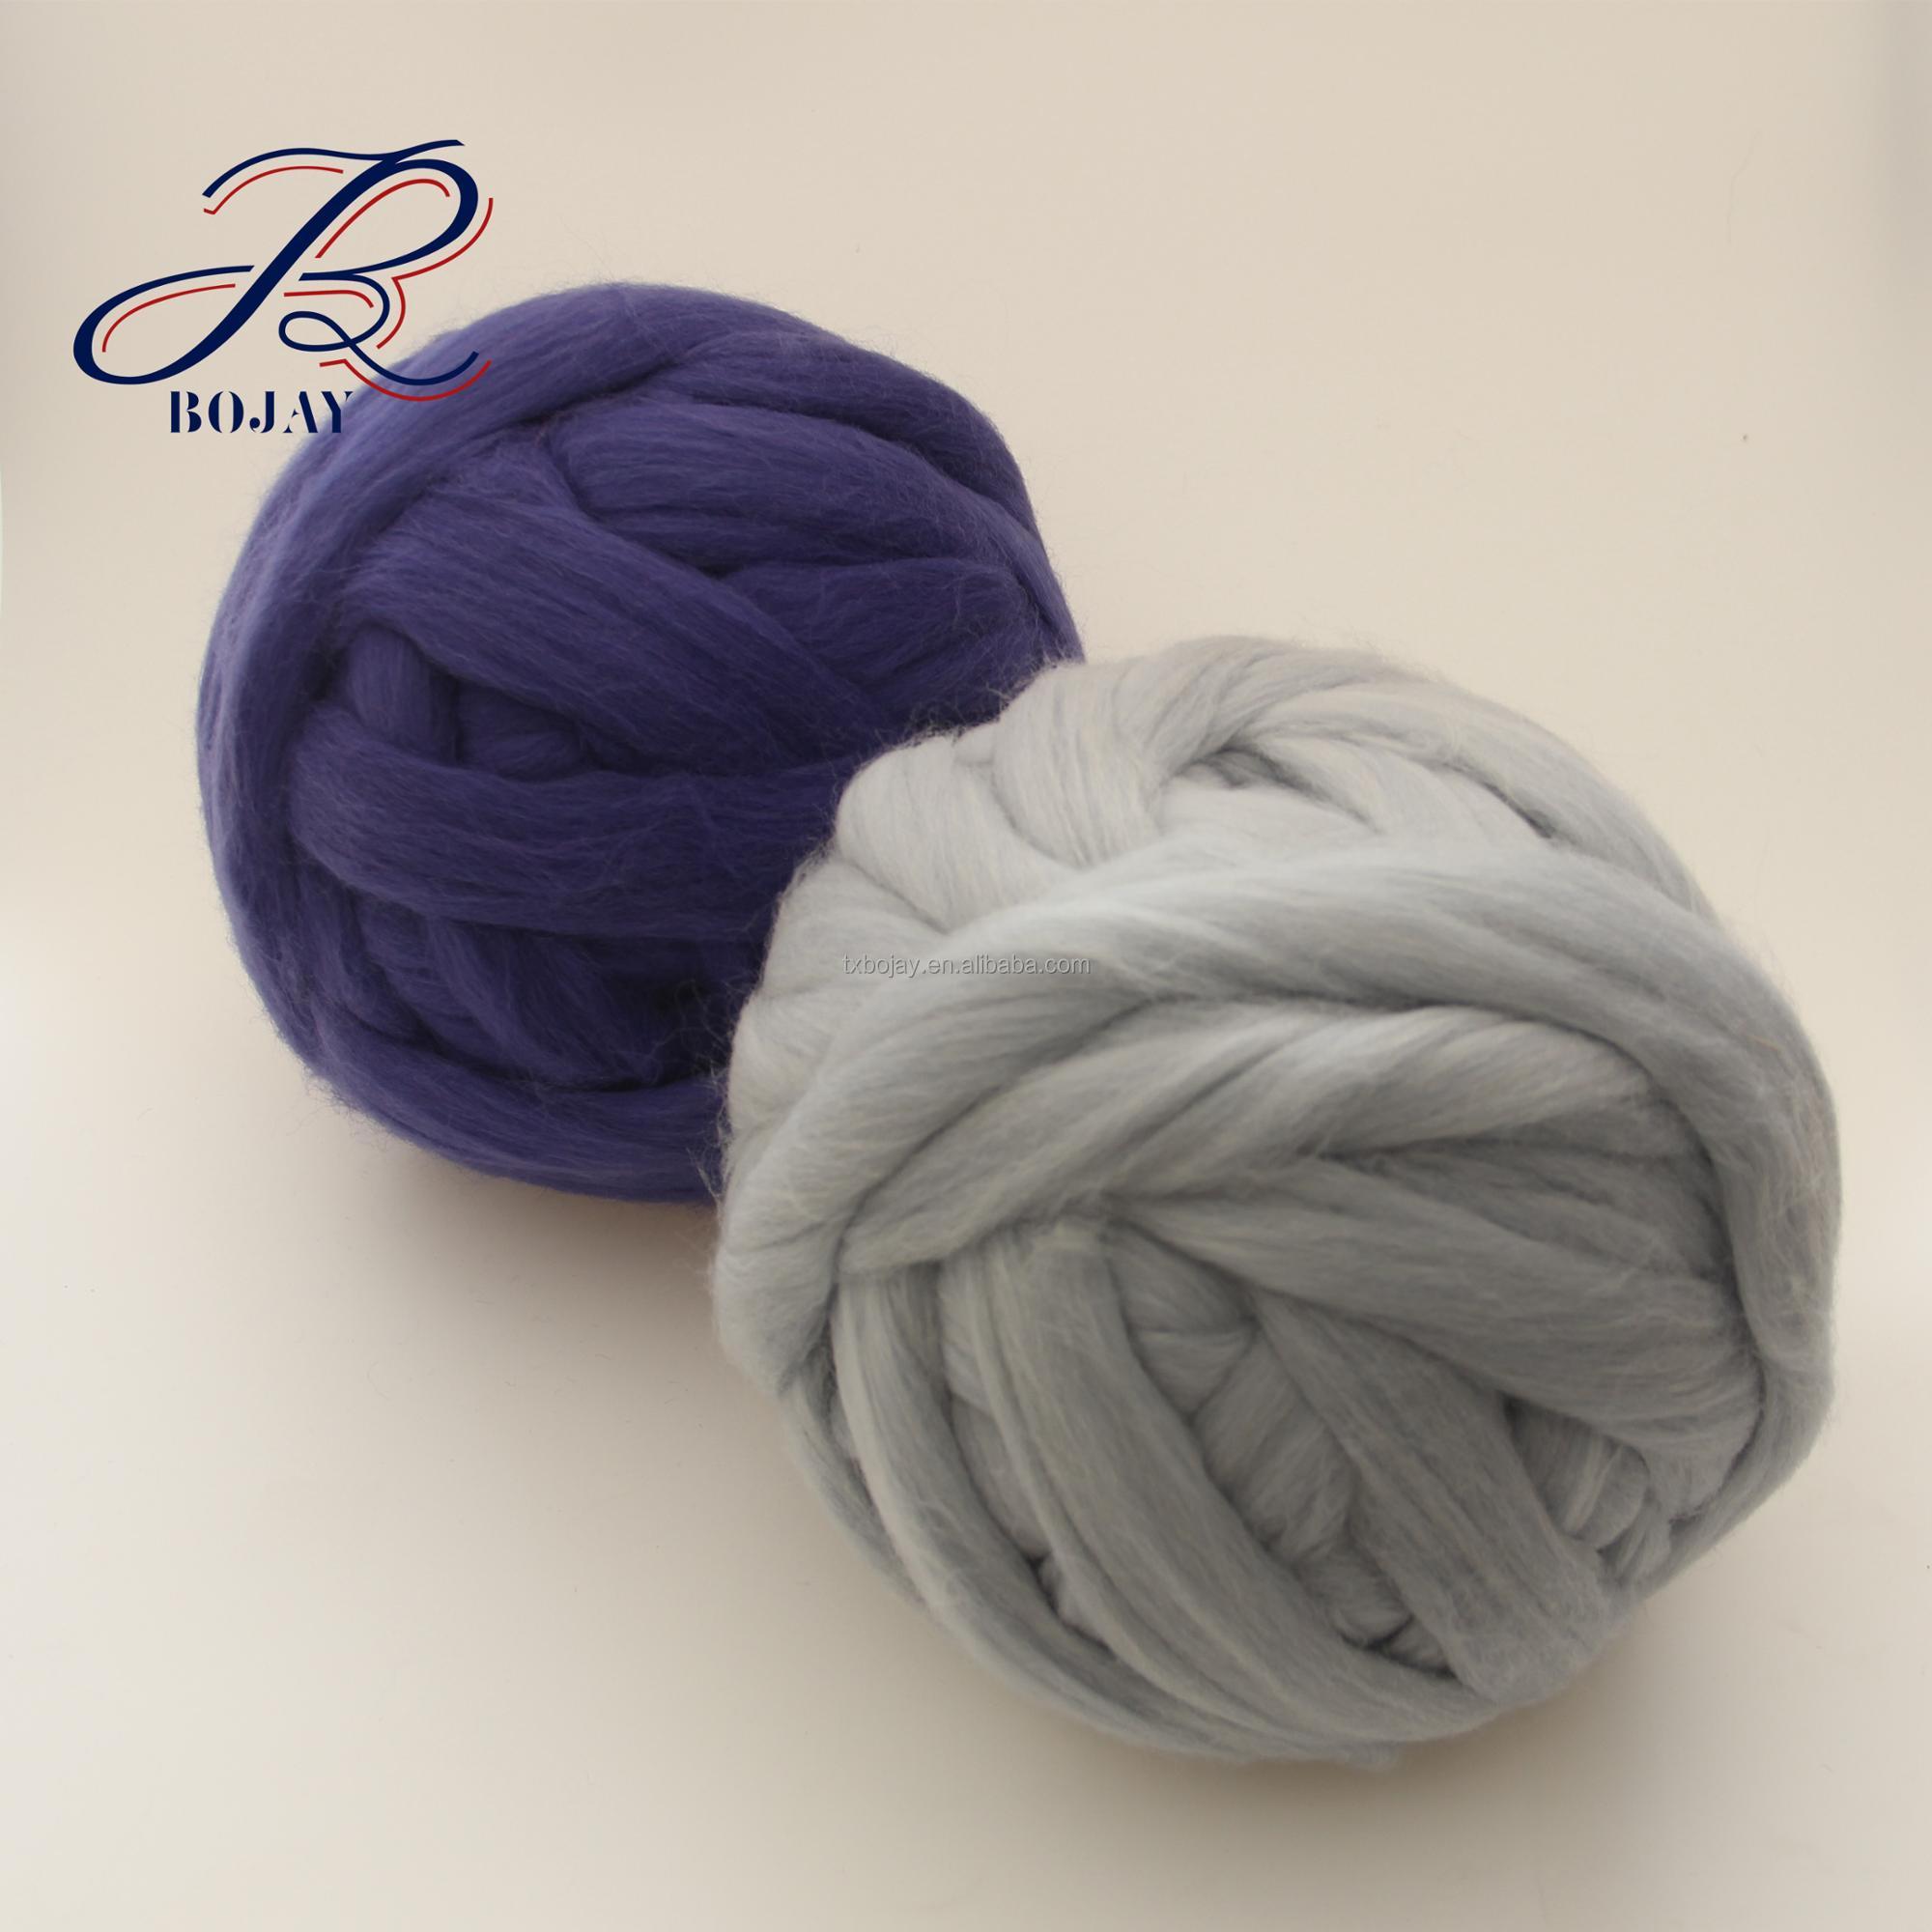 Factory Wholesale and Retail 66s 21 micron 100% Australia Super Chunky Merino Wool Roving Yarn